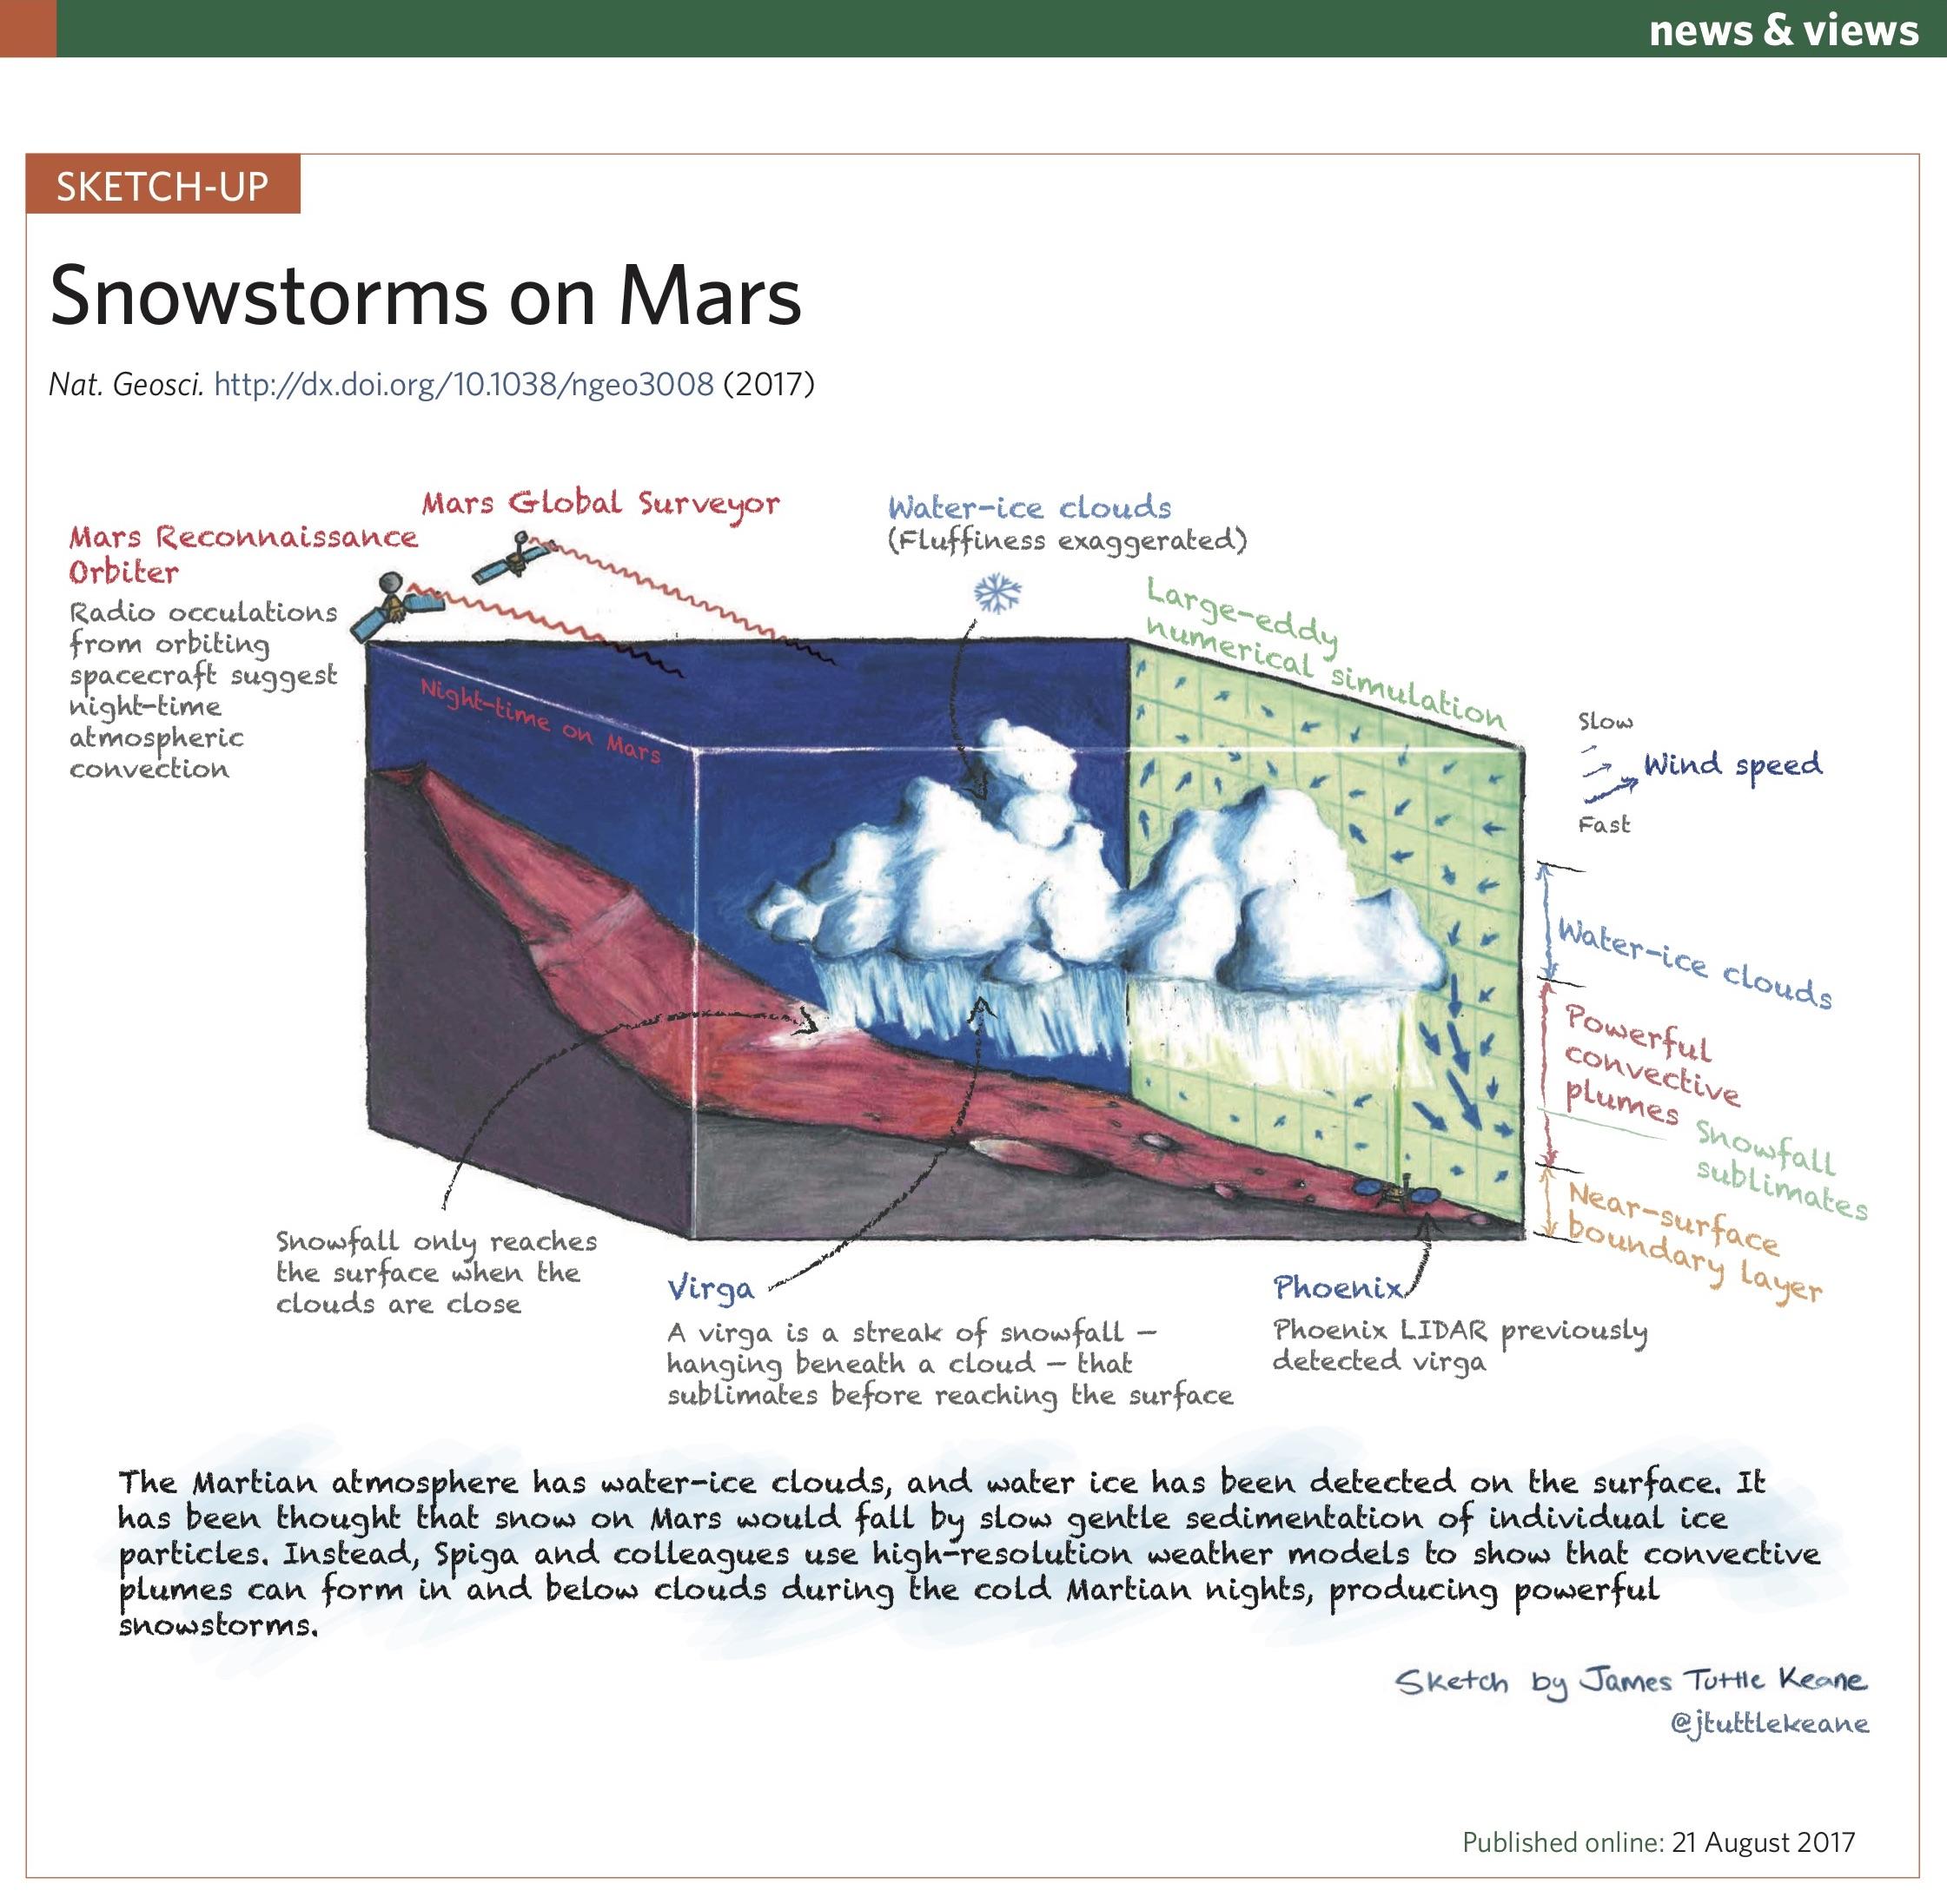 Snowstorms on Mars